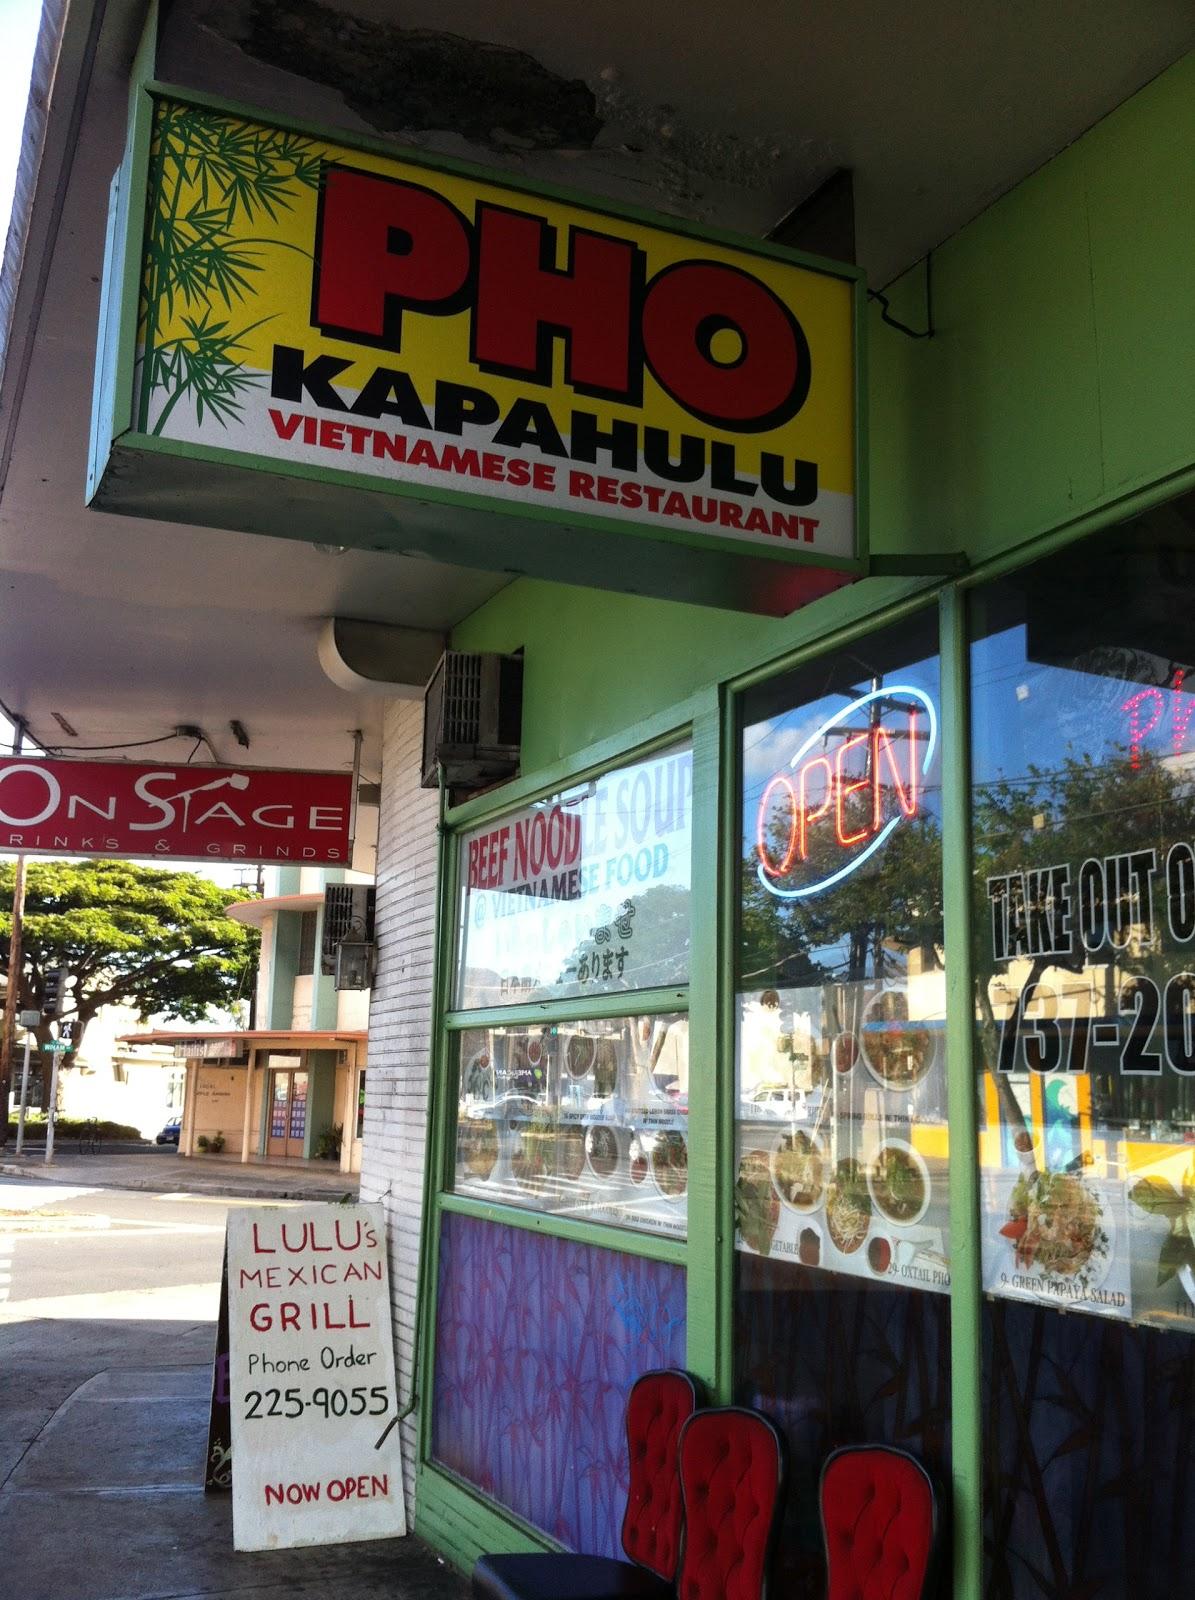 TASTE OF HAWAII: PHO KAPAHULU VIETNAMESE RESTAURANT